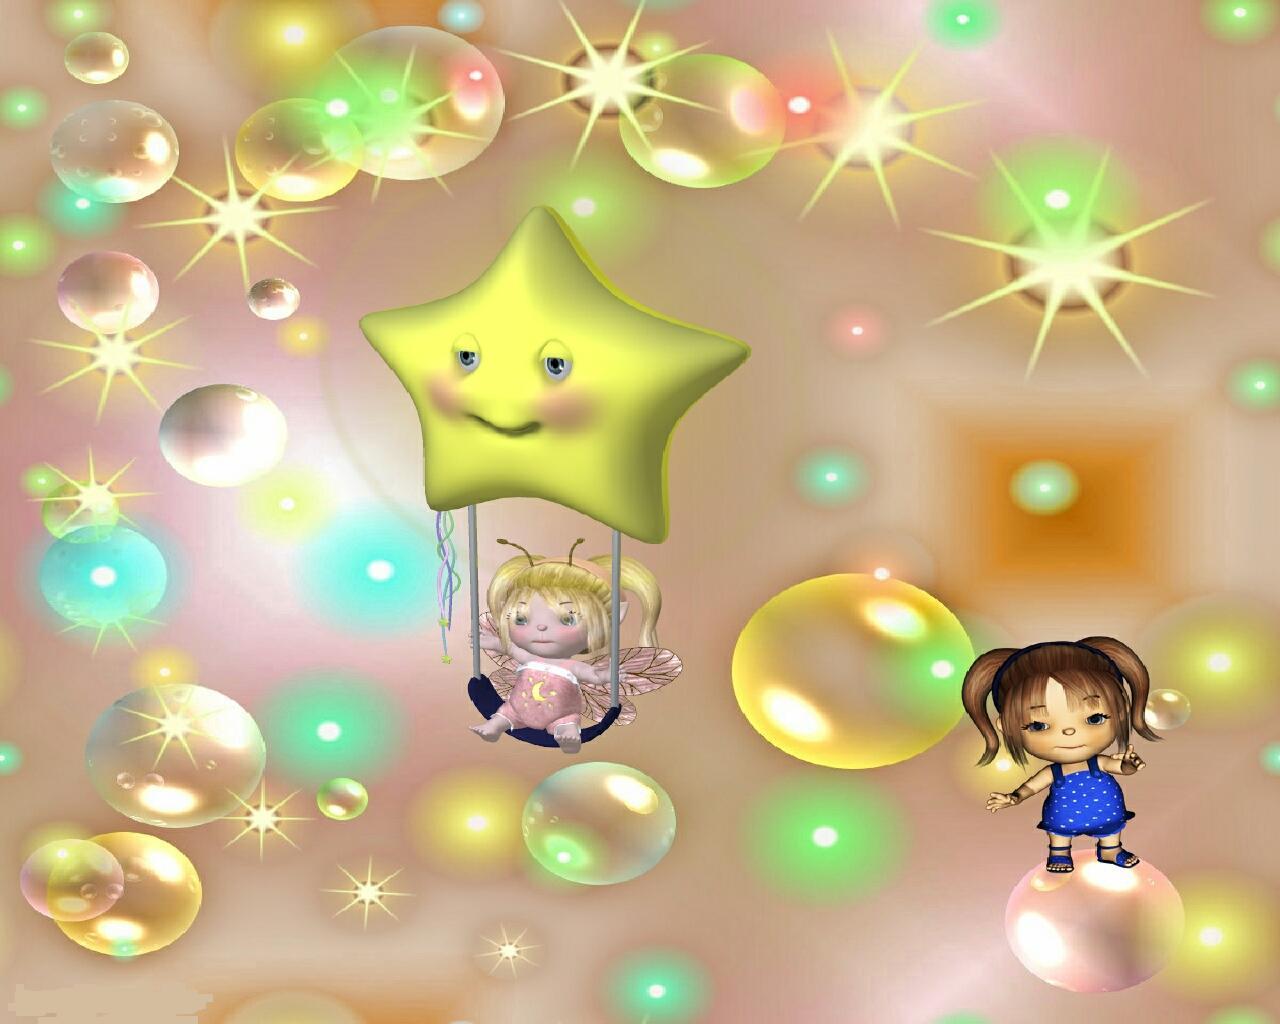 Desktop Backgrounds for Kids wallpaper wallpaper hd 1280x1024